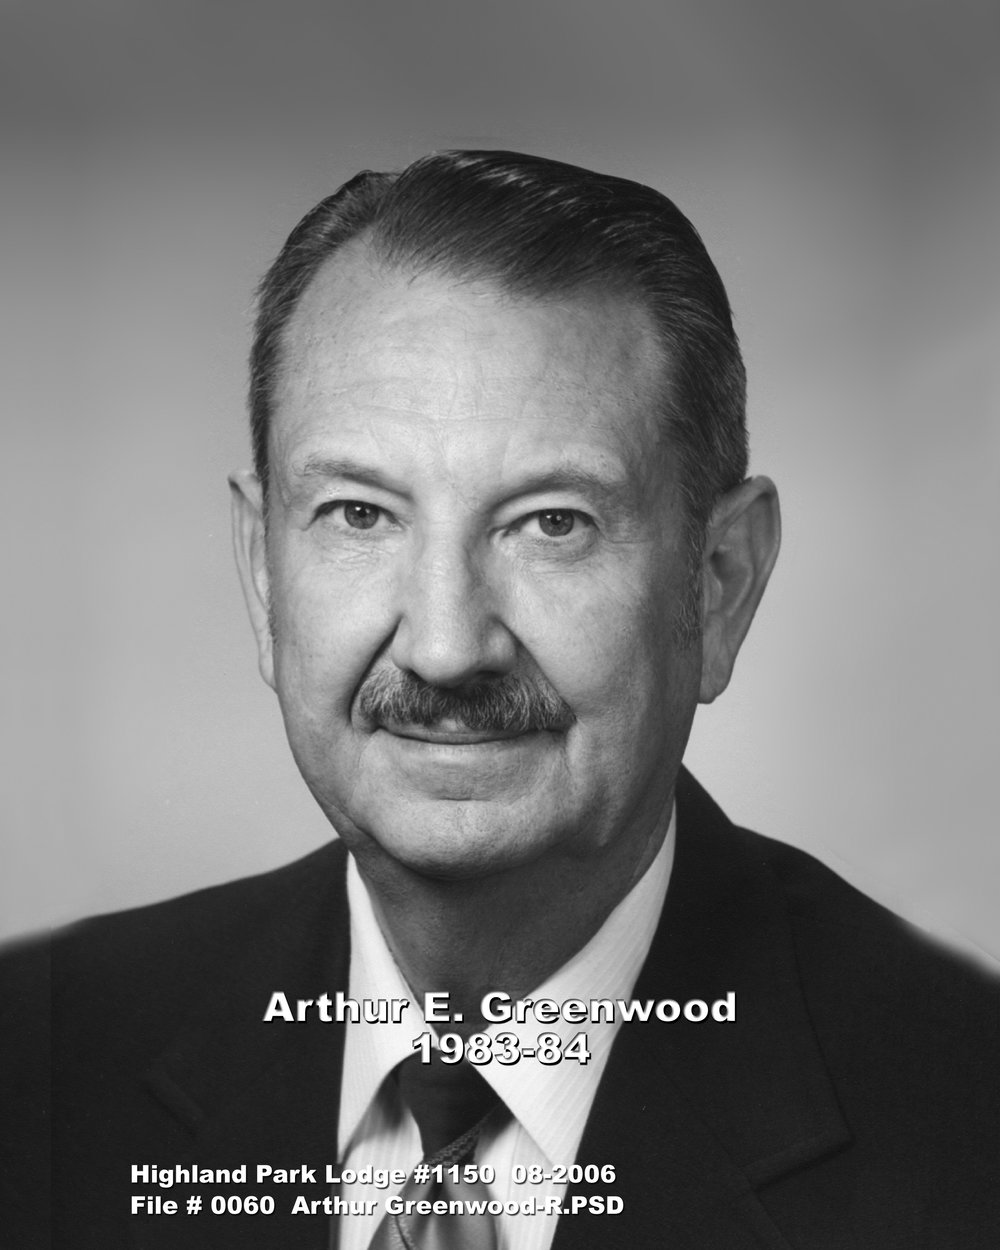 0060 Arthur Greenwood-R.jpg